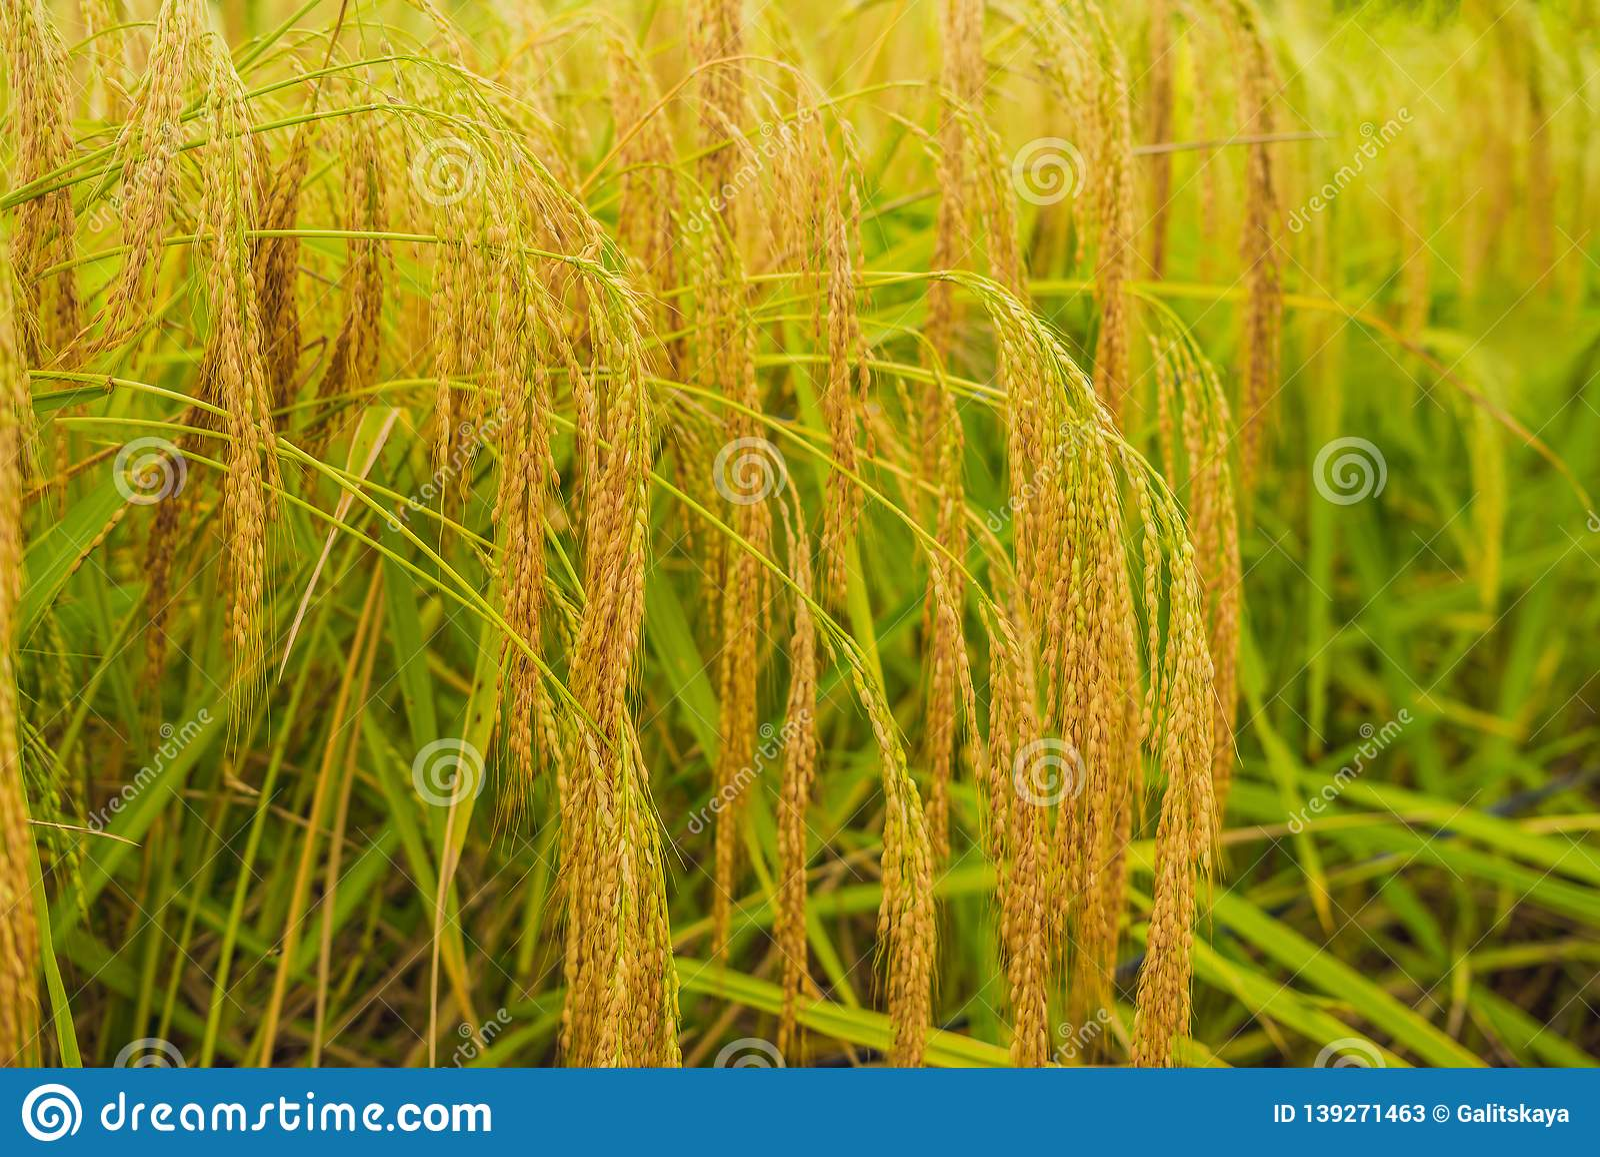 Ripe ears of rice. Closeup of rice ear on plantation